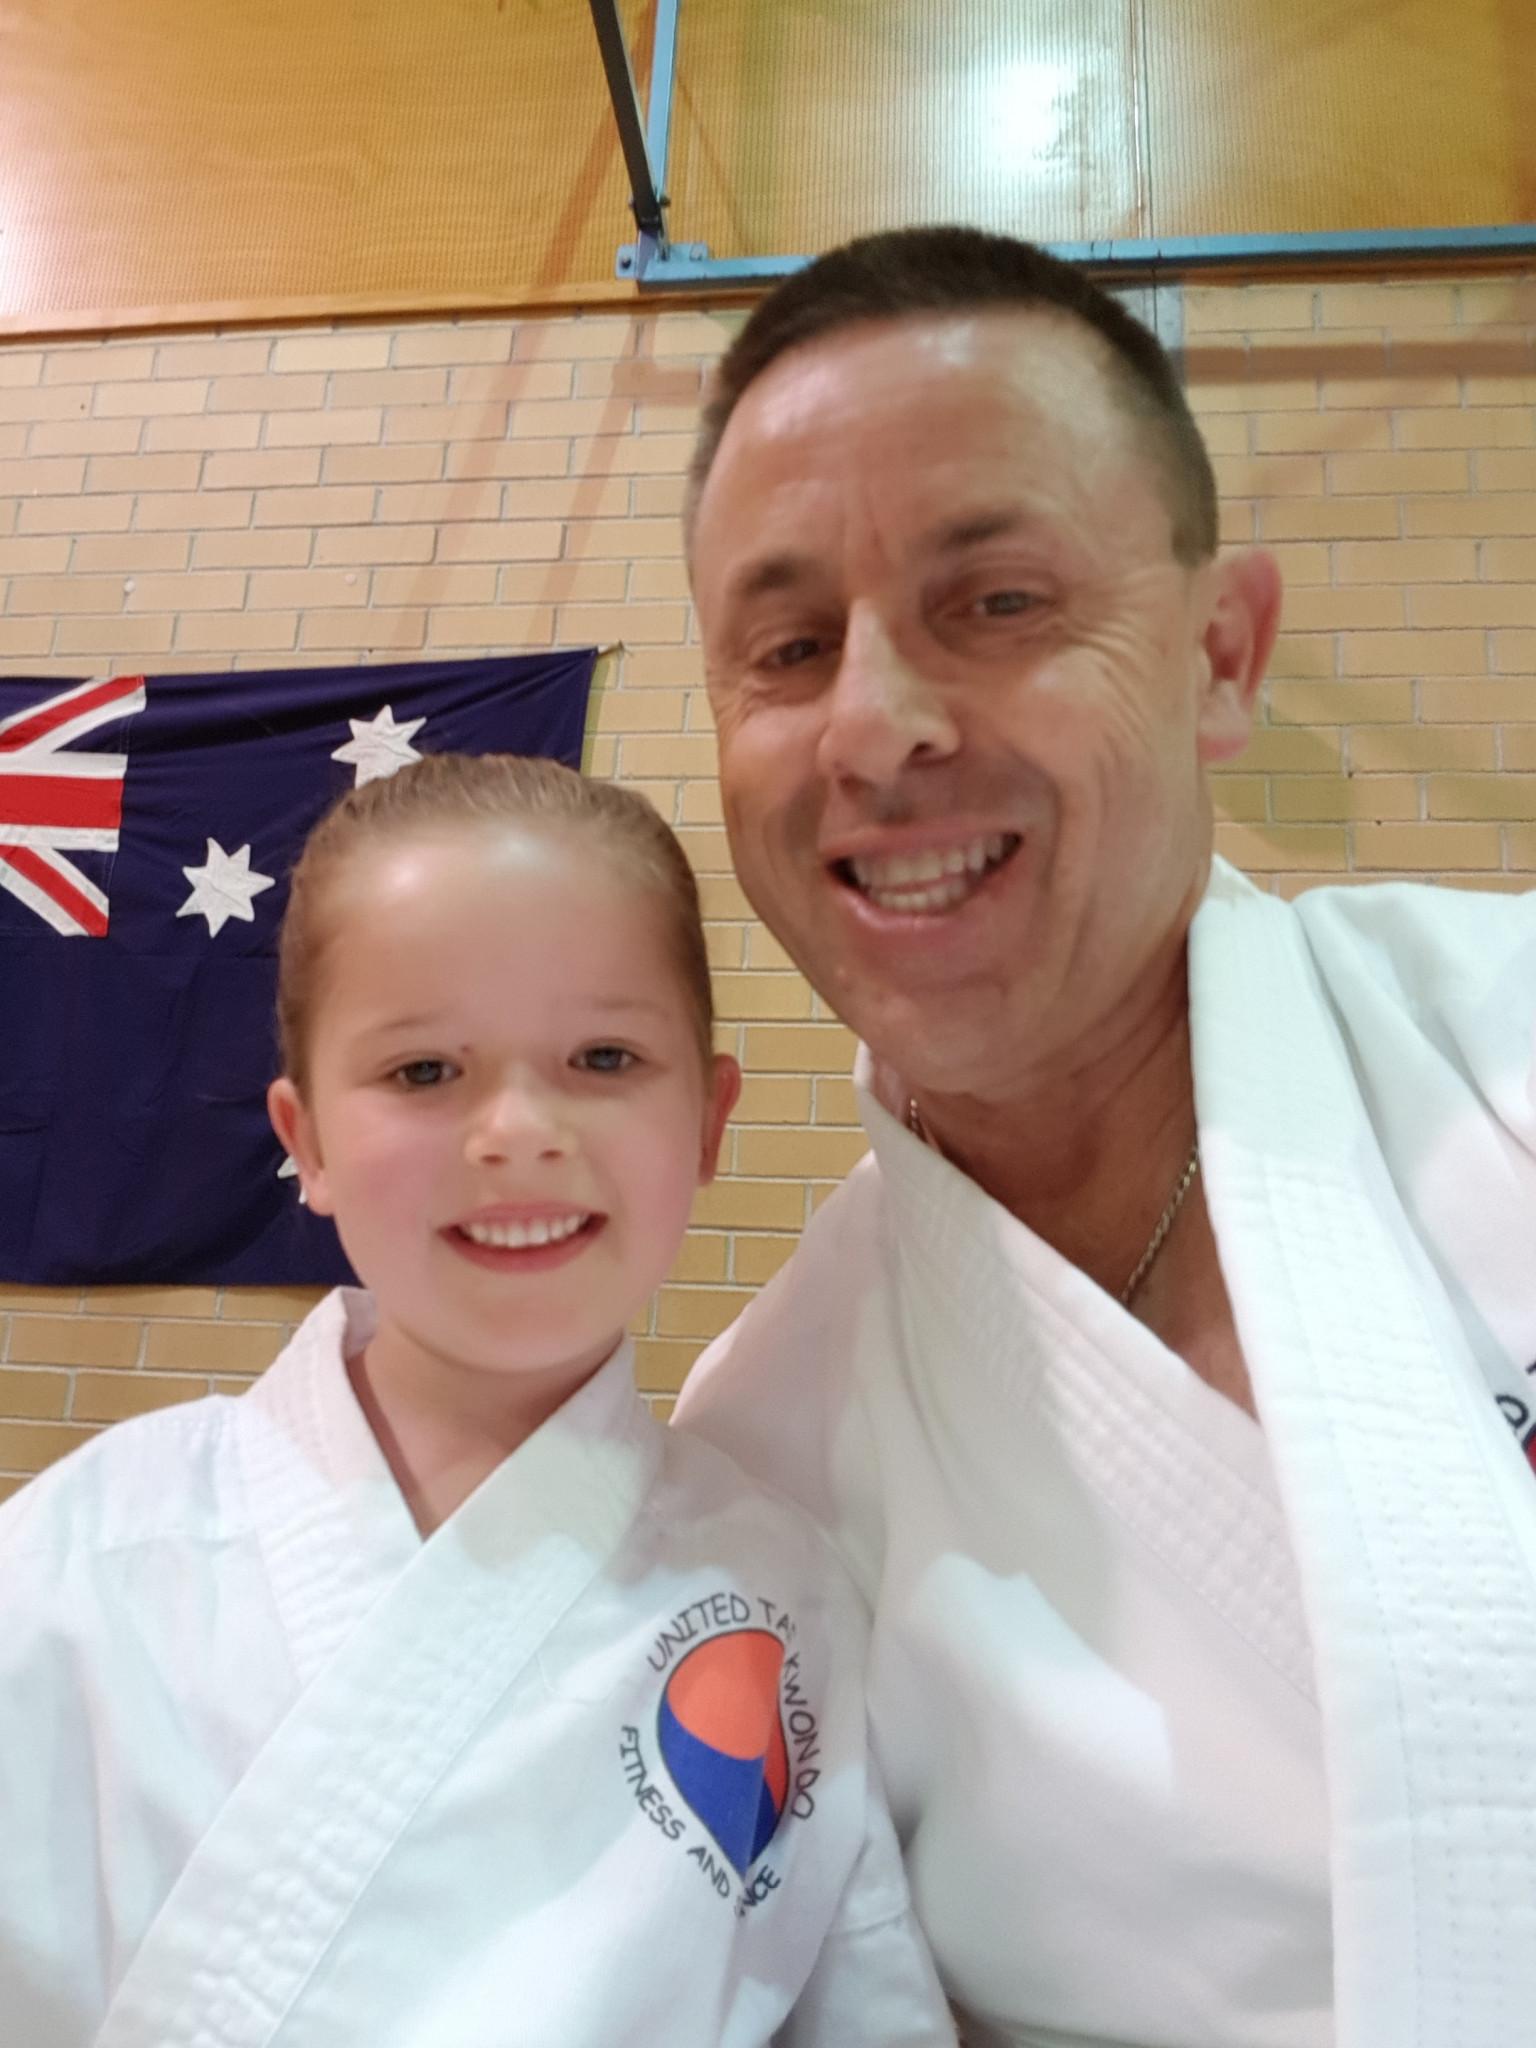 Taekwondo master calls for sport to be used to prevent bullying in Australia